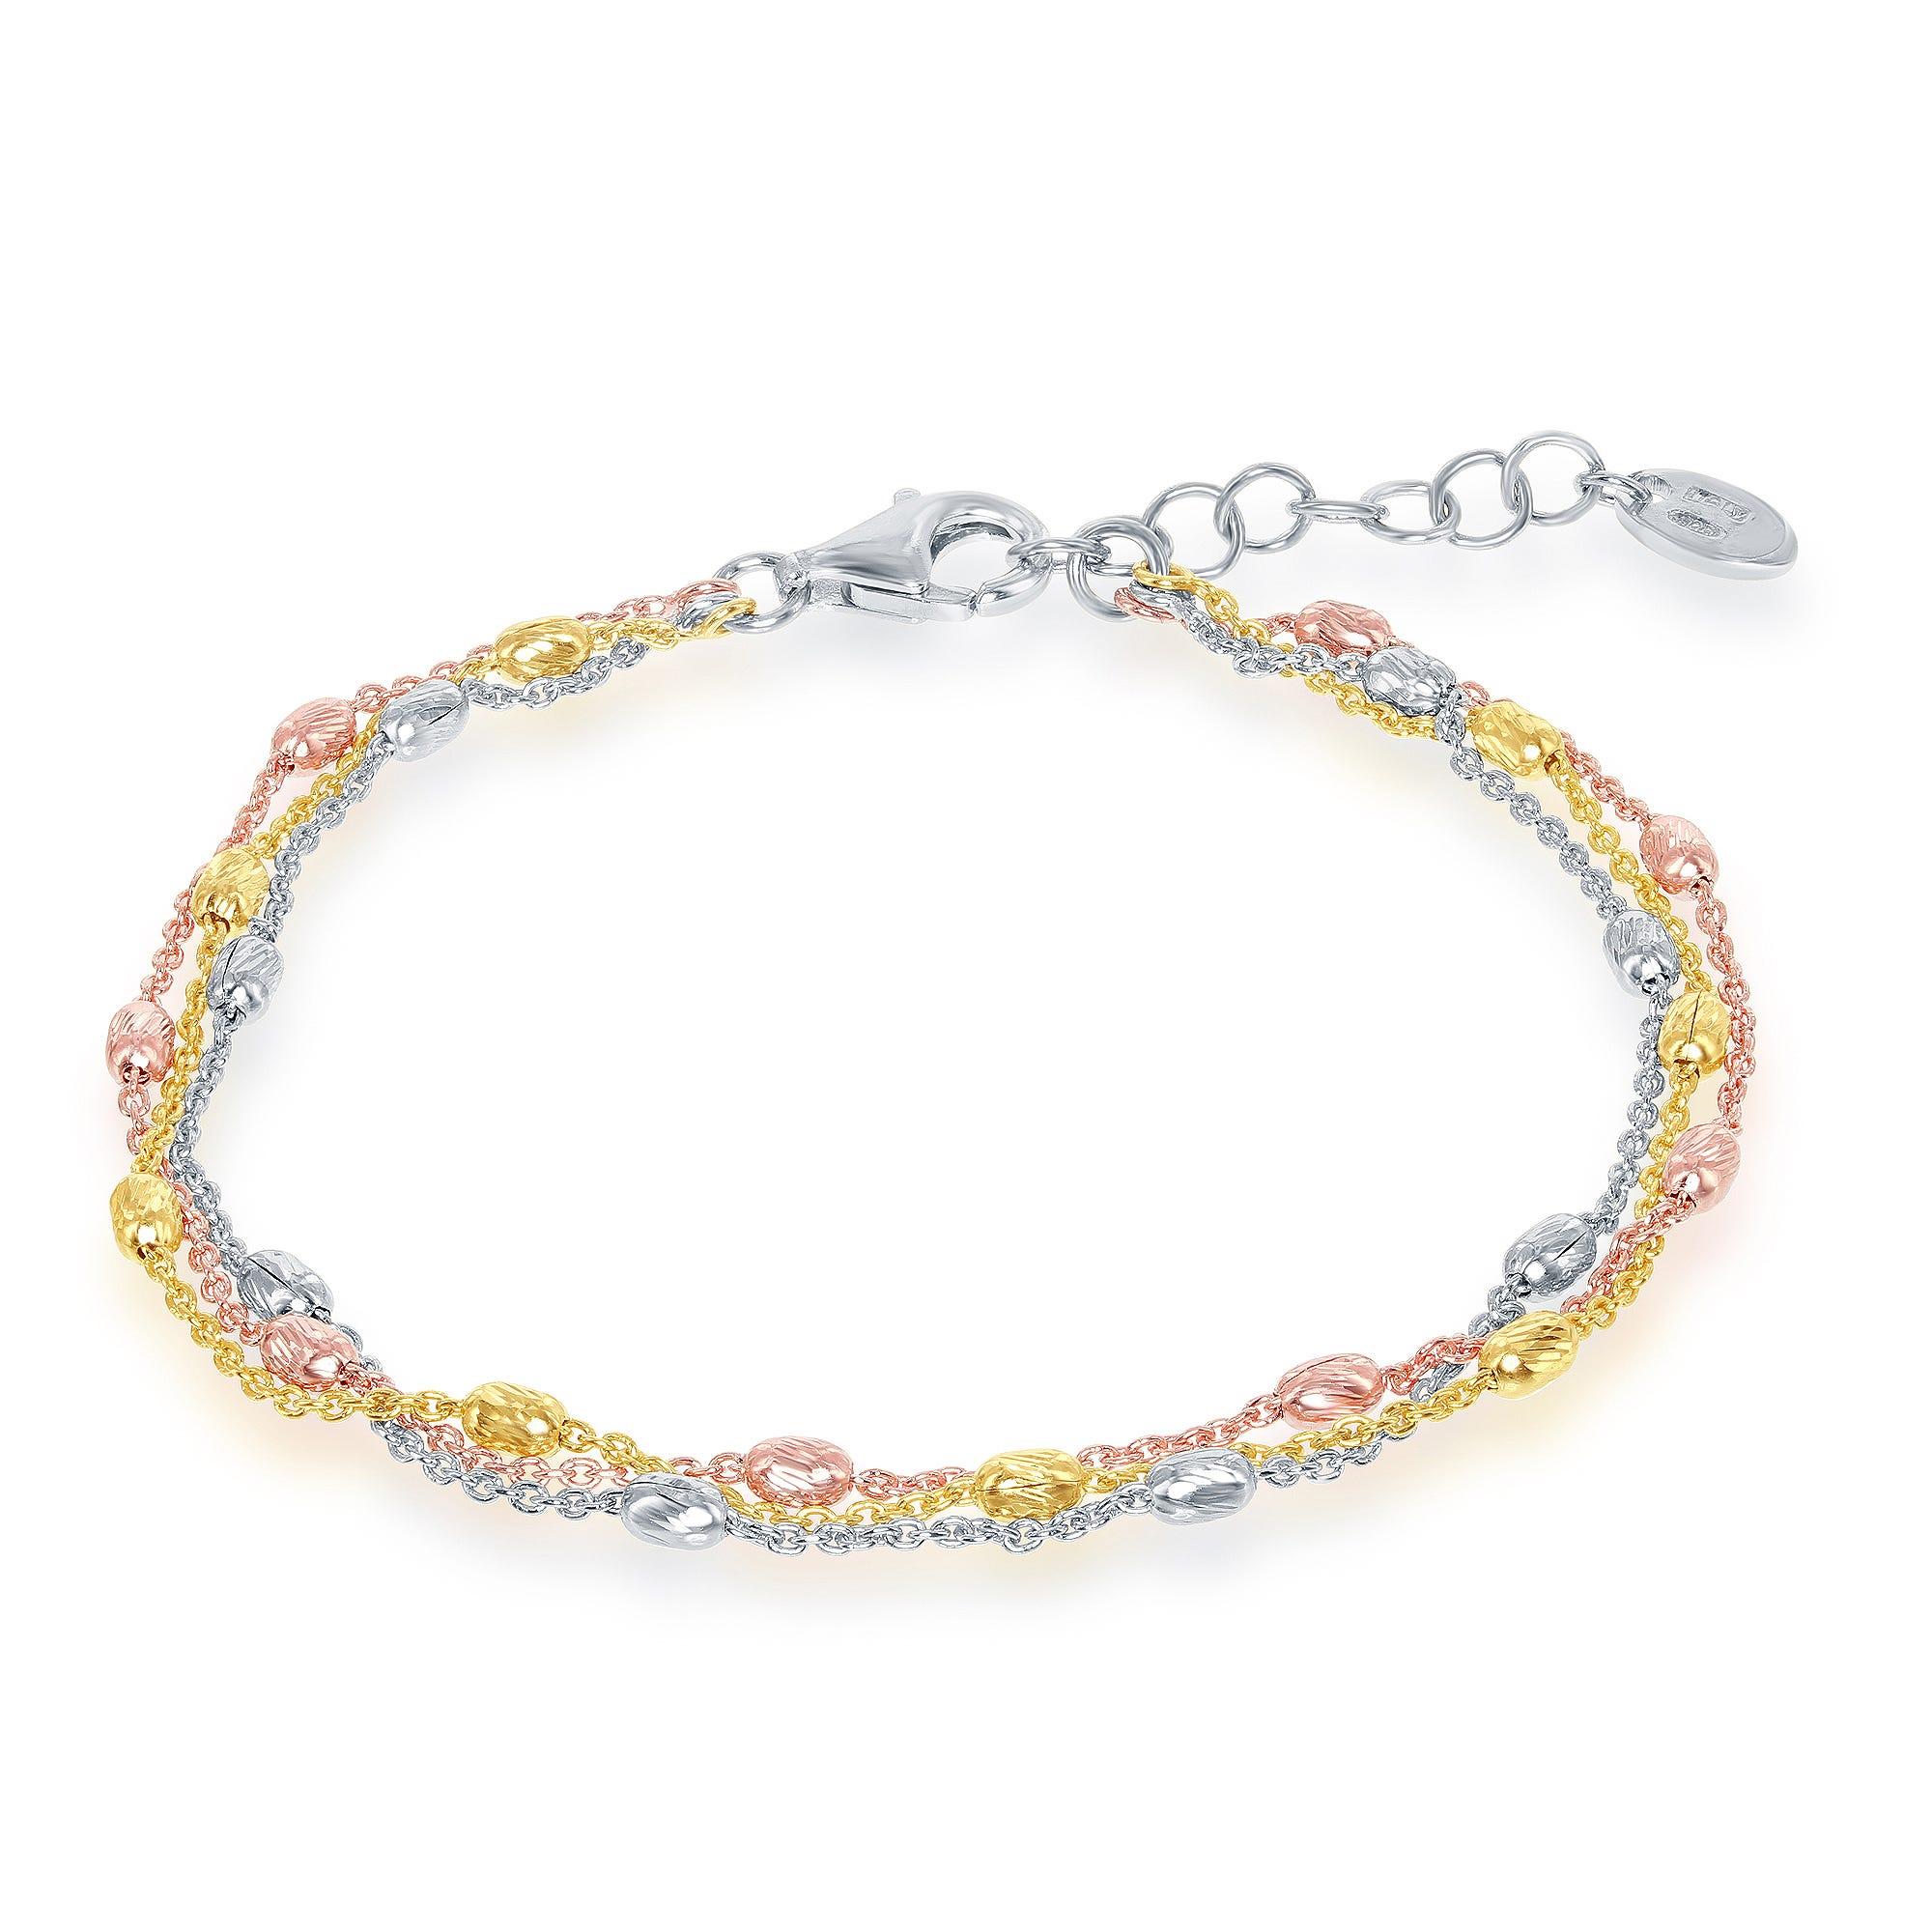 Tri-Color Triple Strand Oval Bead Bracelet in Sterling Silver